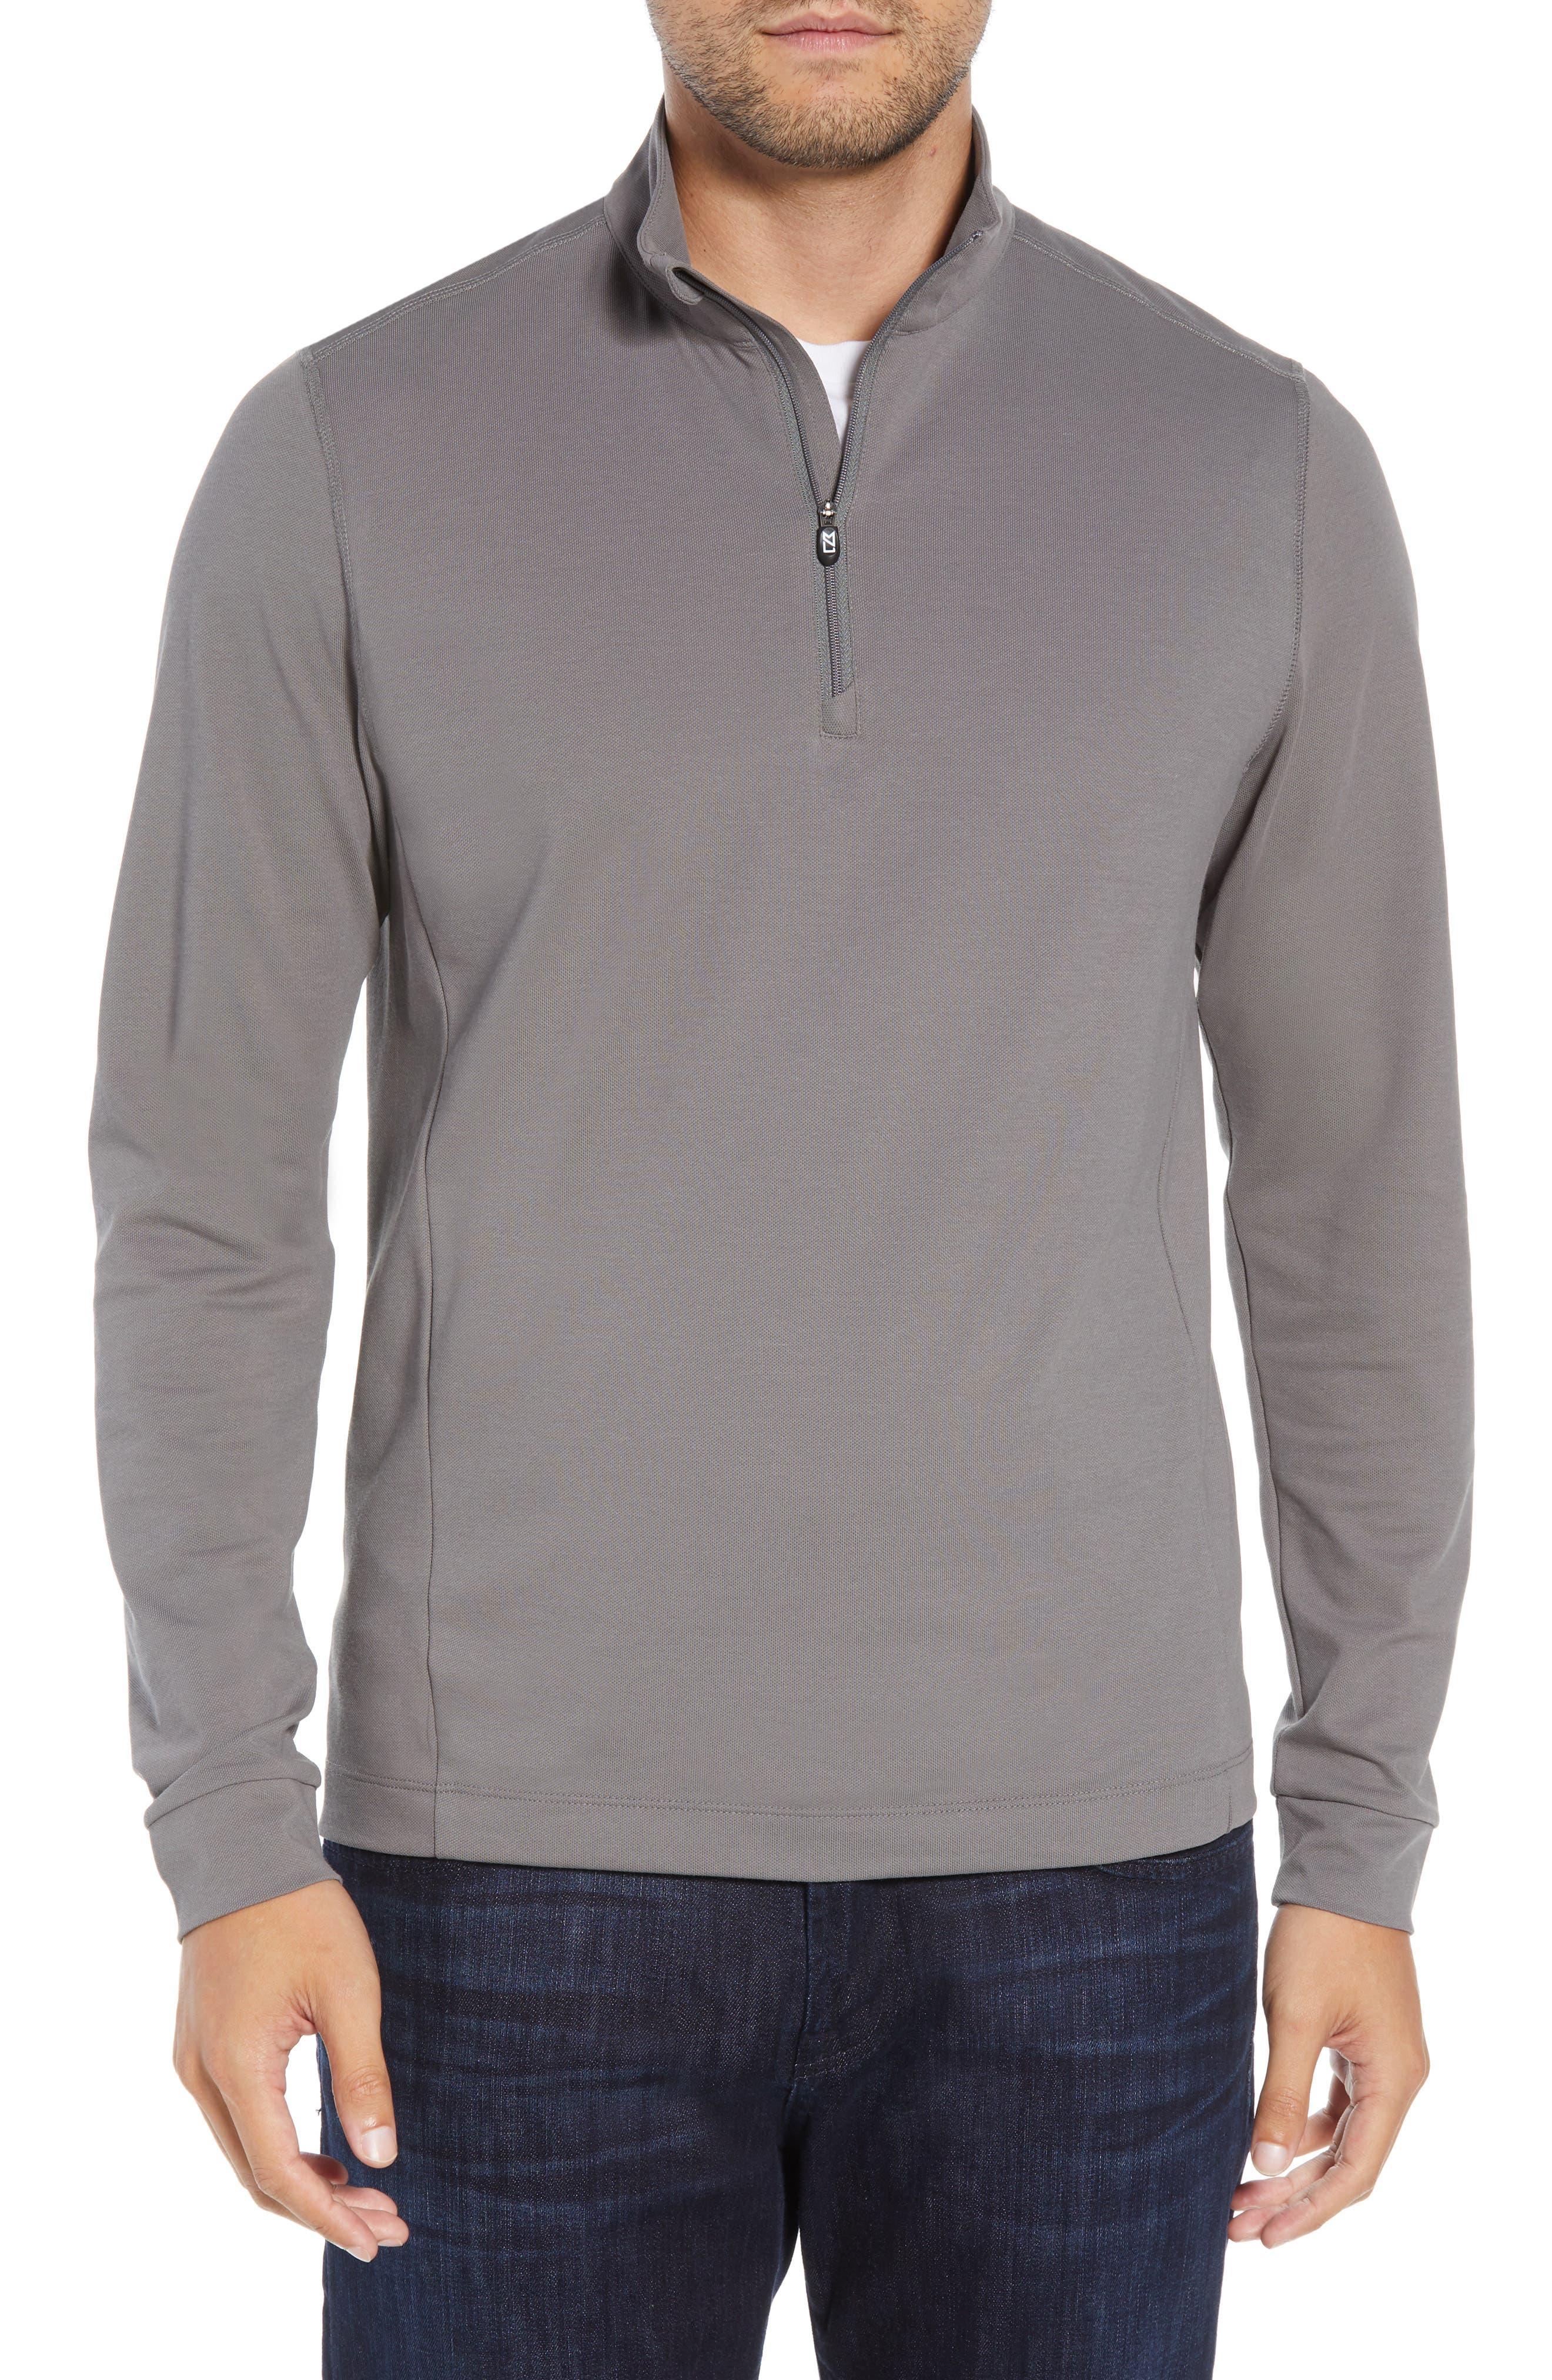 CUTTER & BUCK, Advantage Regular Fit DryTec Mock Neck Pullover, Main thumbnail 1, color, ELEMENTAL GREY